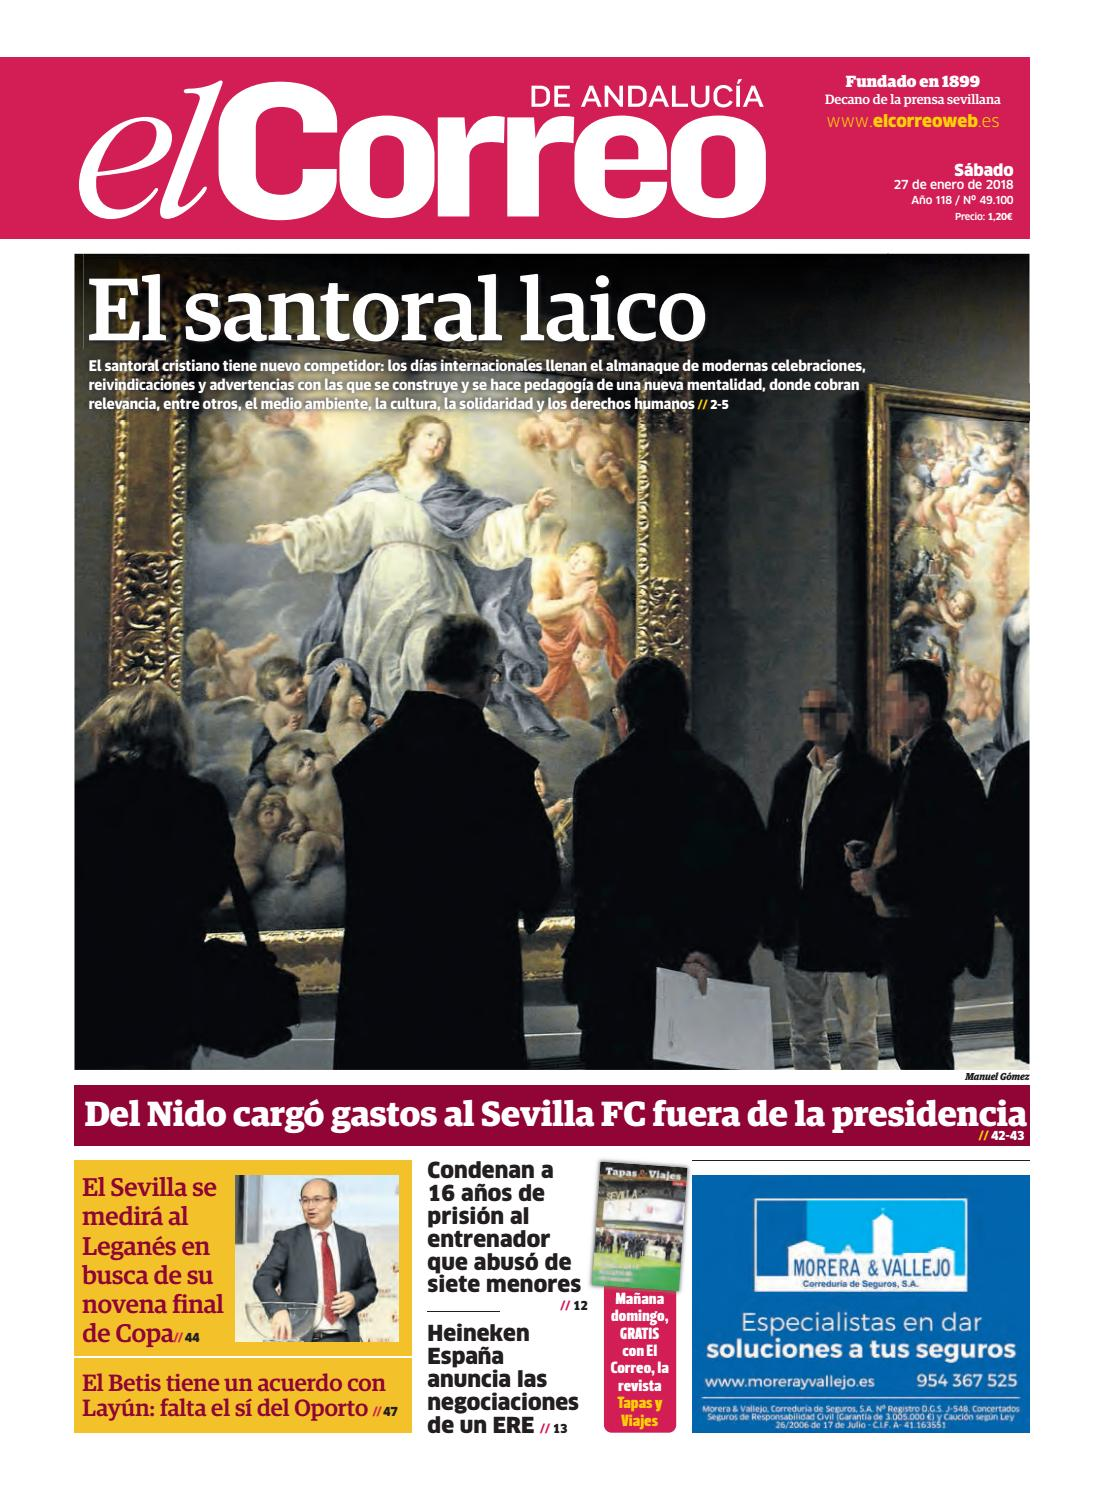 27.01.2018 El Correo de Andalucía by EL CORREO DE ANDALUCÍA S.L. - issuu e6569a4ecd9